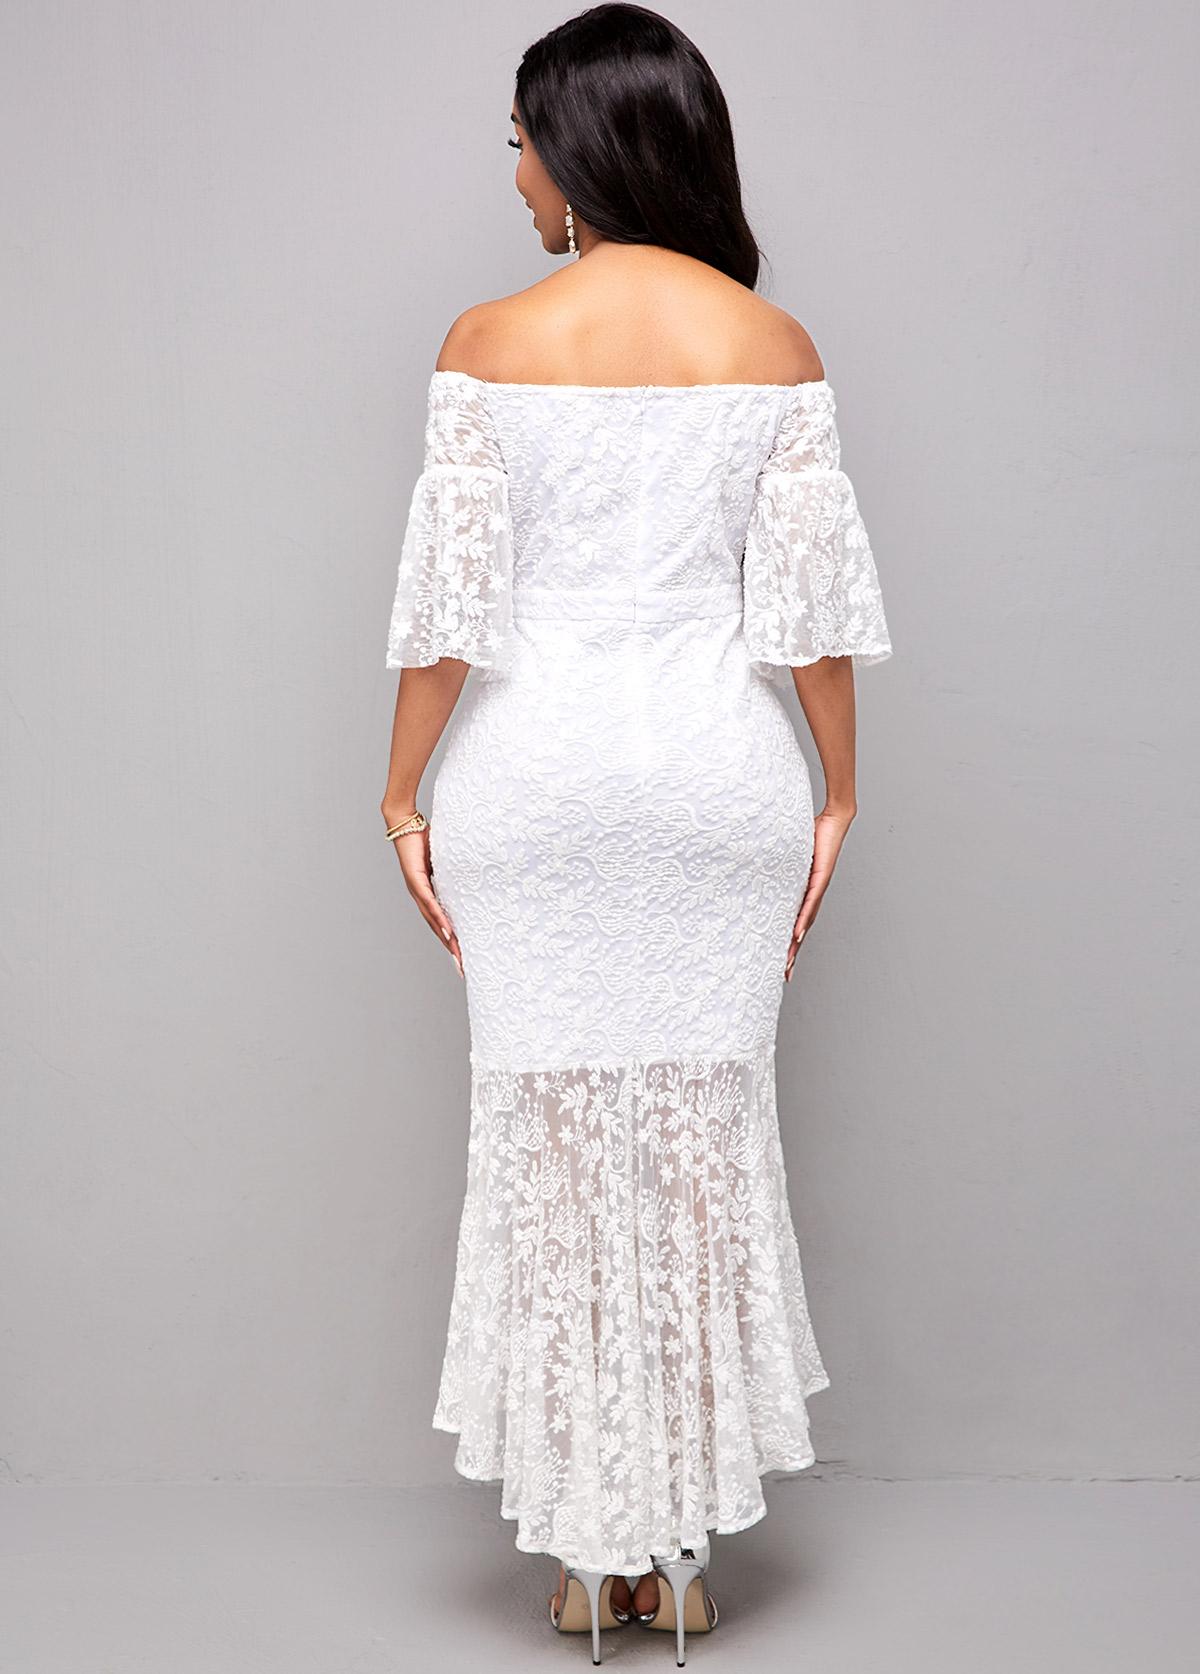 3/4 Sleeve Off Shoulder Lace Mermaid Dress